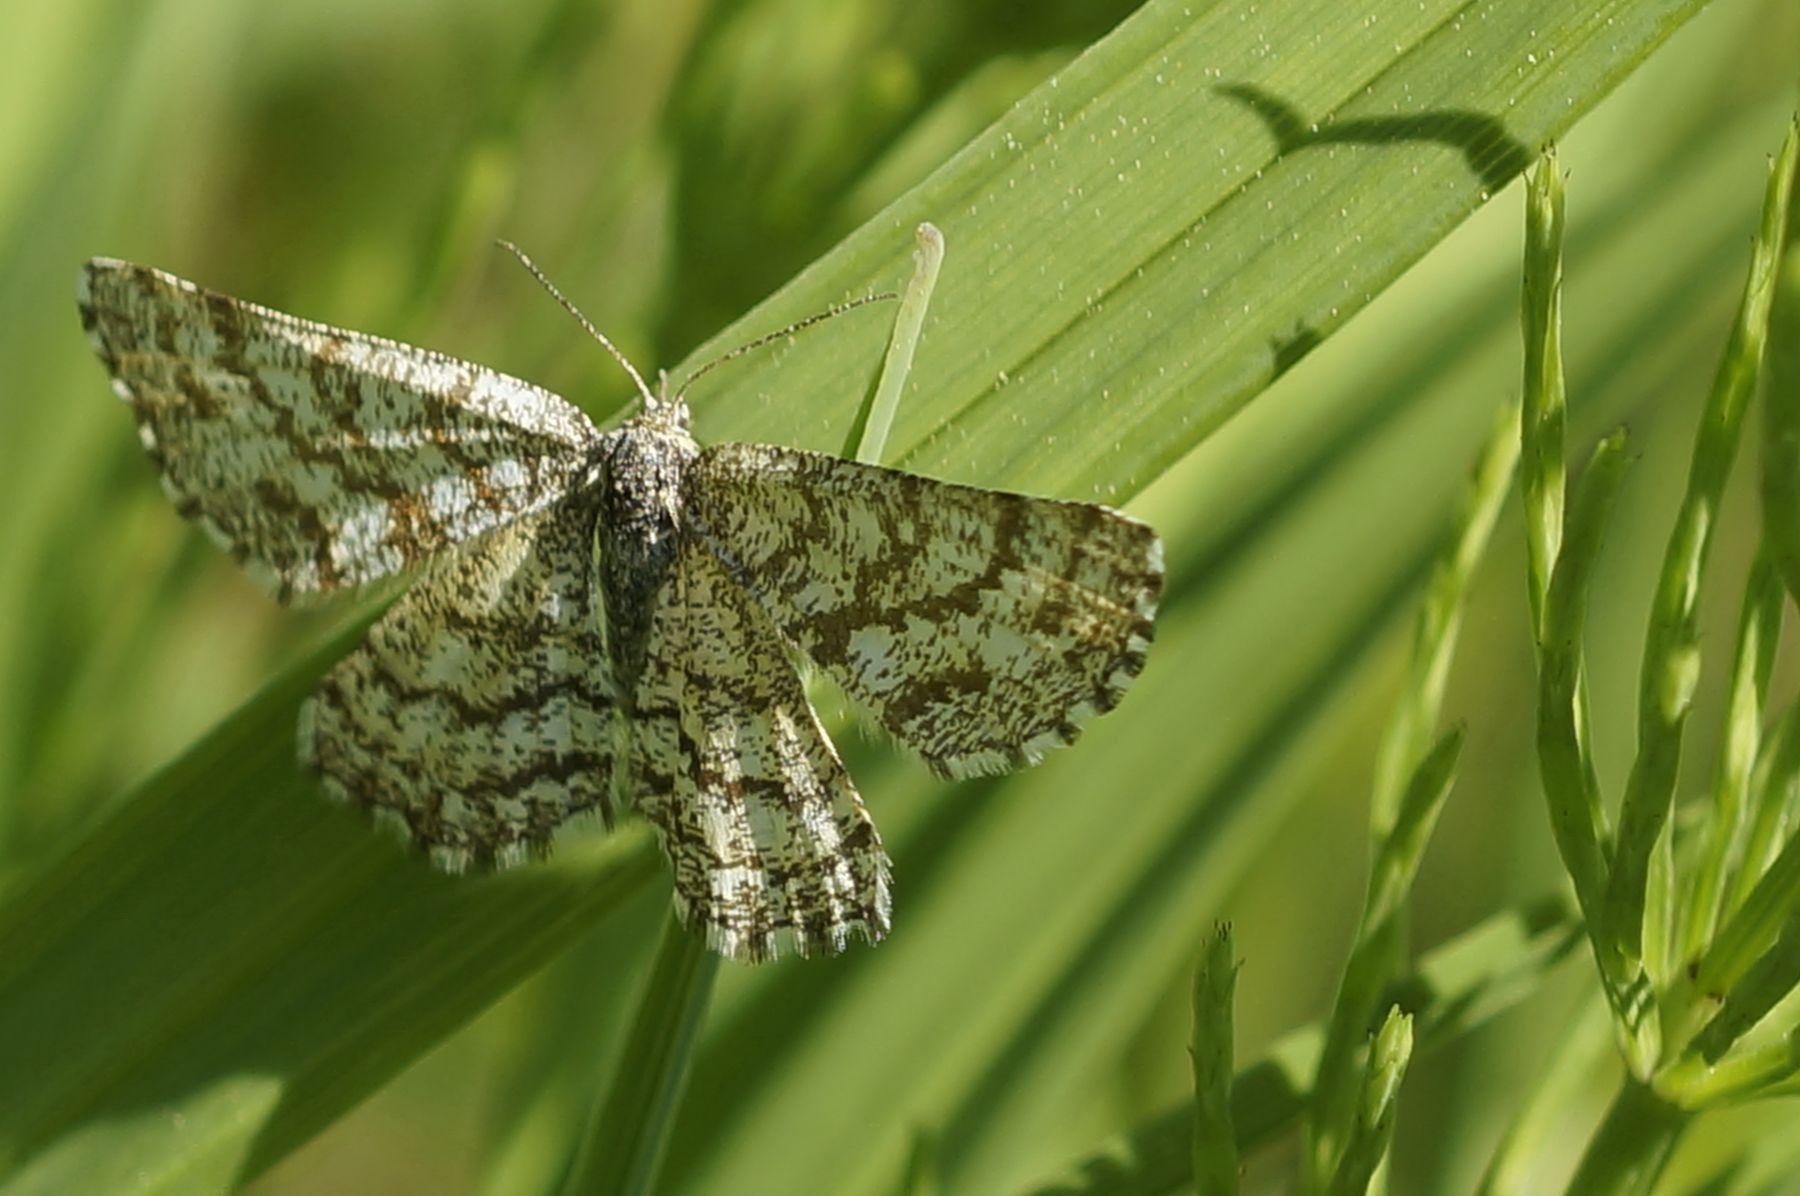 Пяденица пяденица бабочка лето лес трава